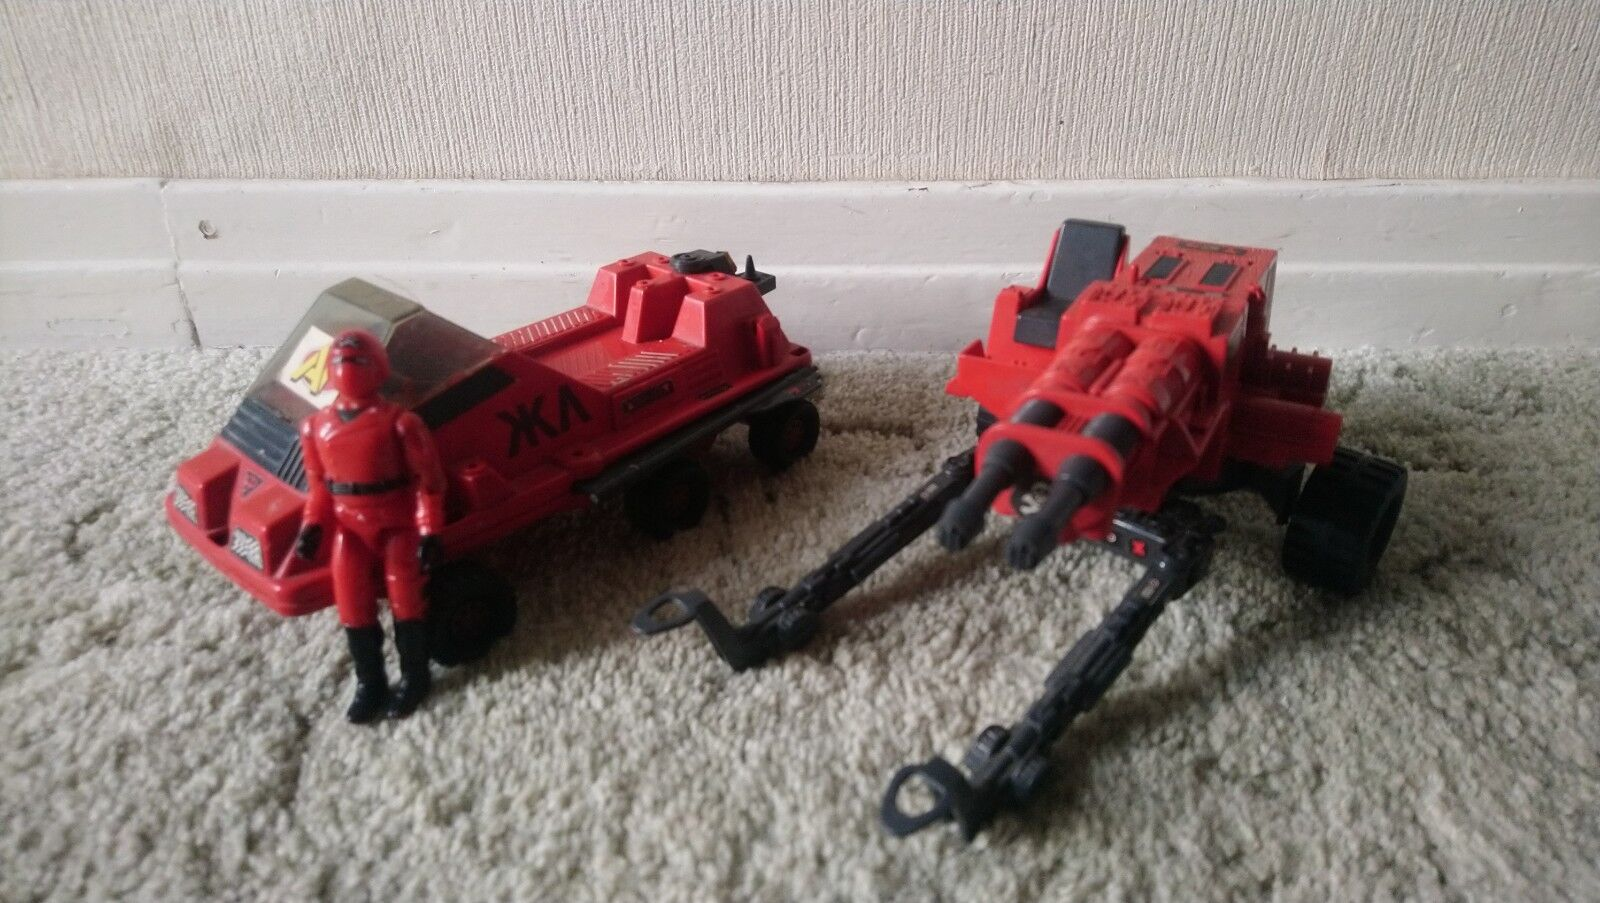 Gi Joe Rojo Sombras láser Exterminador pistola fuerza de acción Láser Rojo Vintage